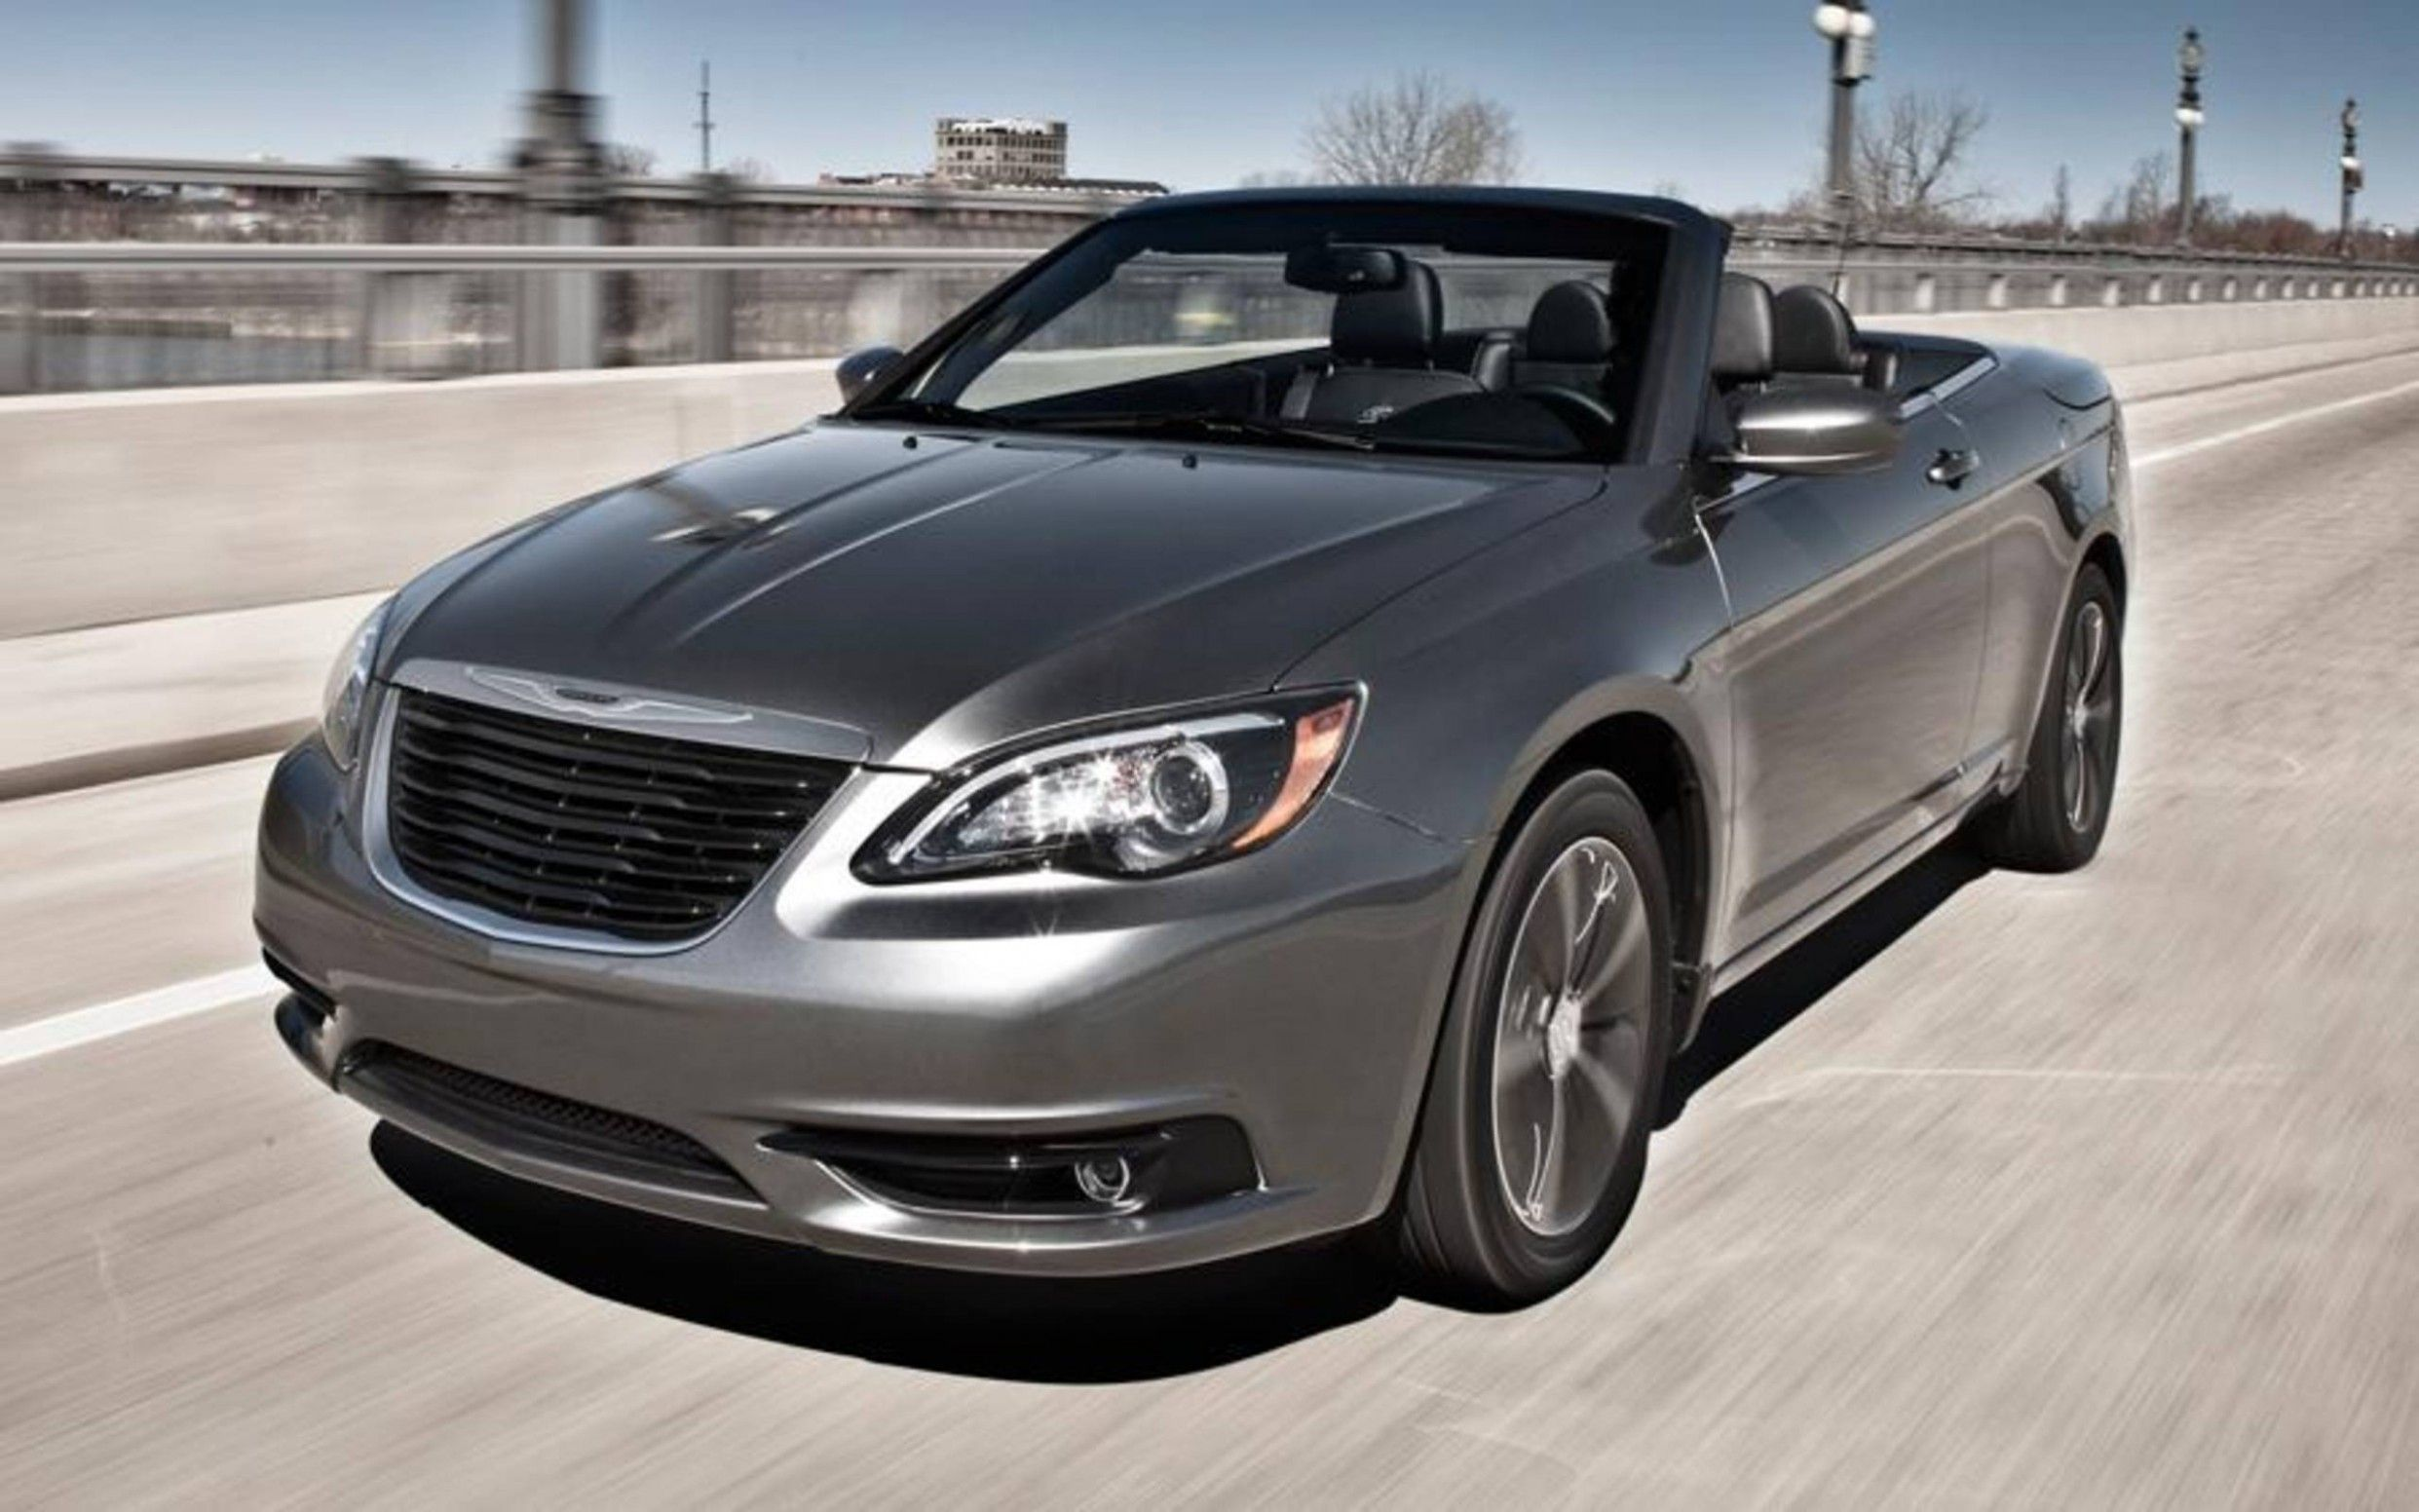 2021 Chrysler 200 Convertible Srt New Model and Performance